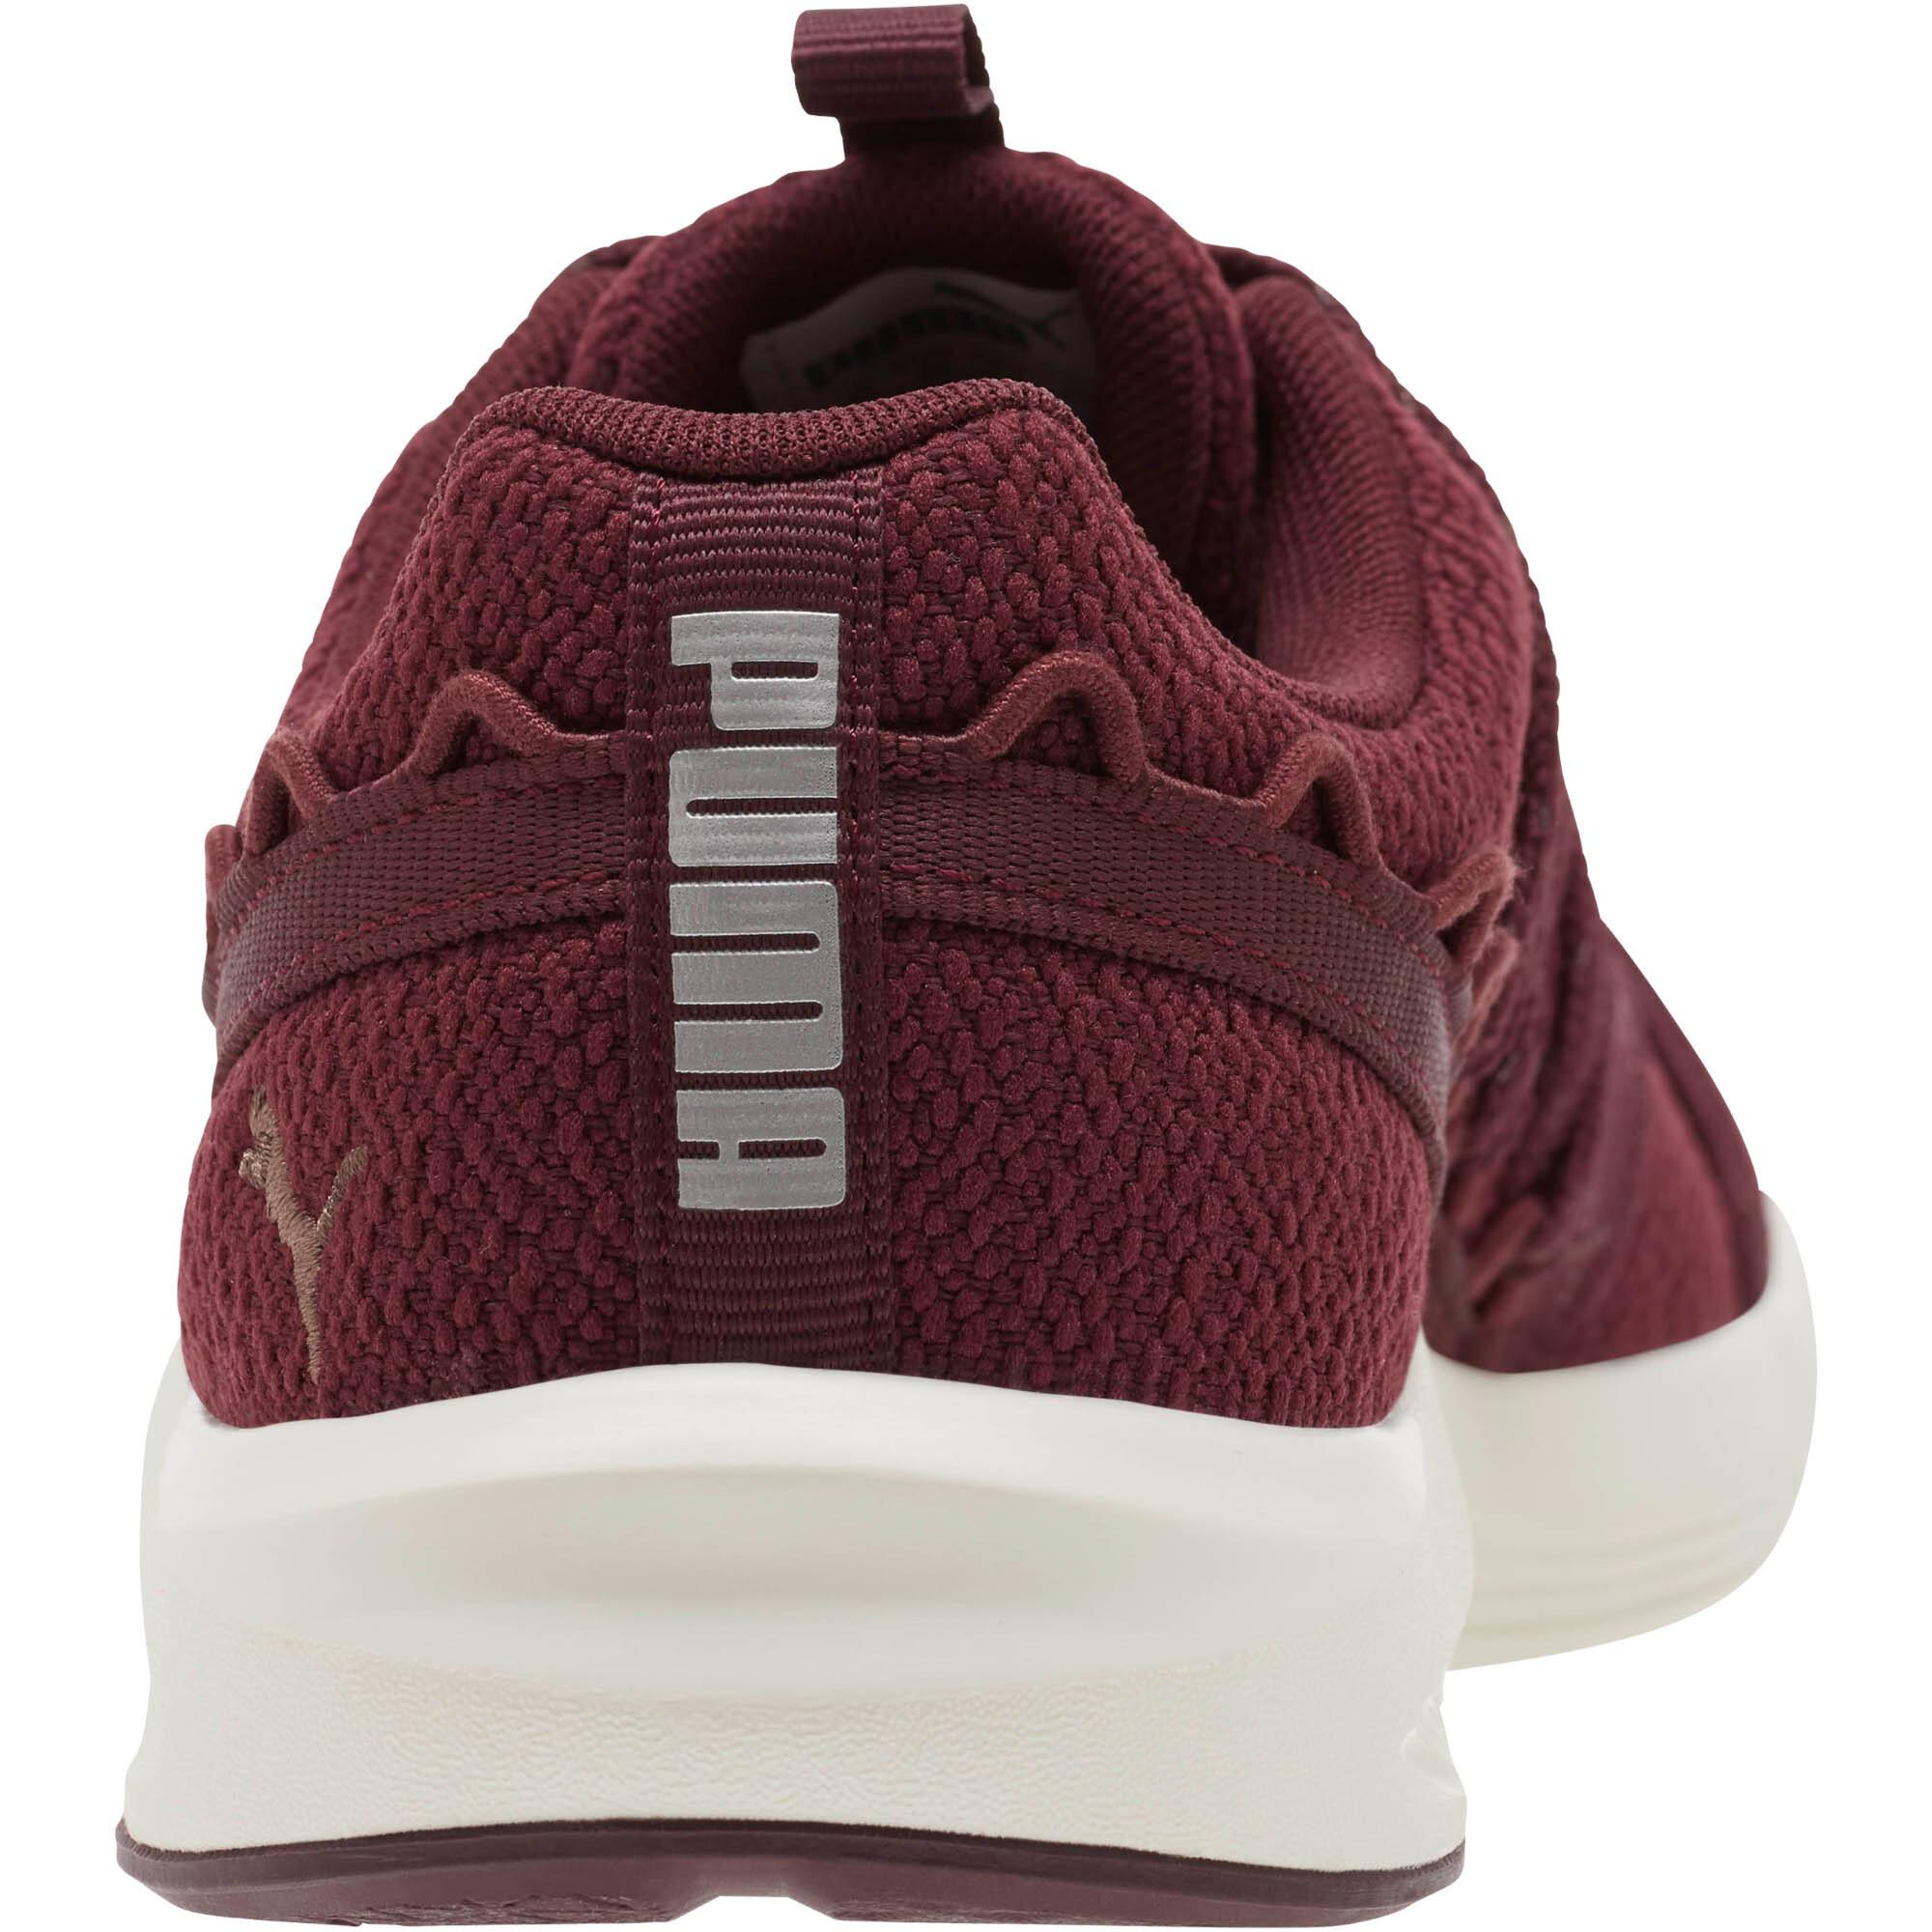 PUMA-Prowl-Alt-2-LX-Women-039-s-Training-Shoes-Women-Shoe-Training thumbnail 3